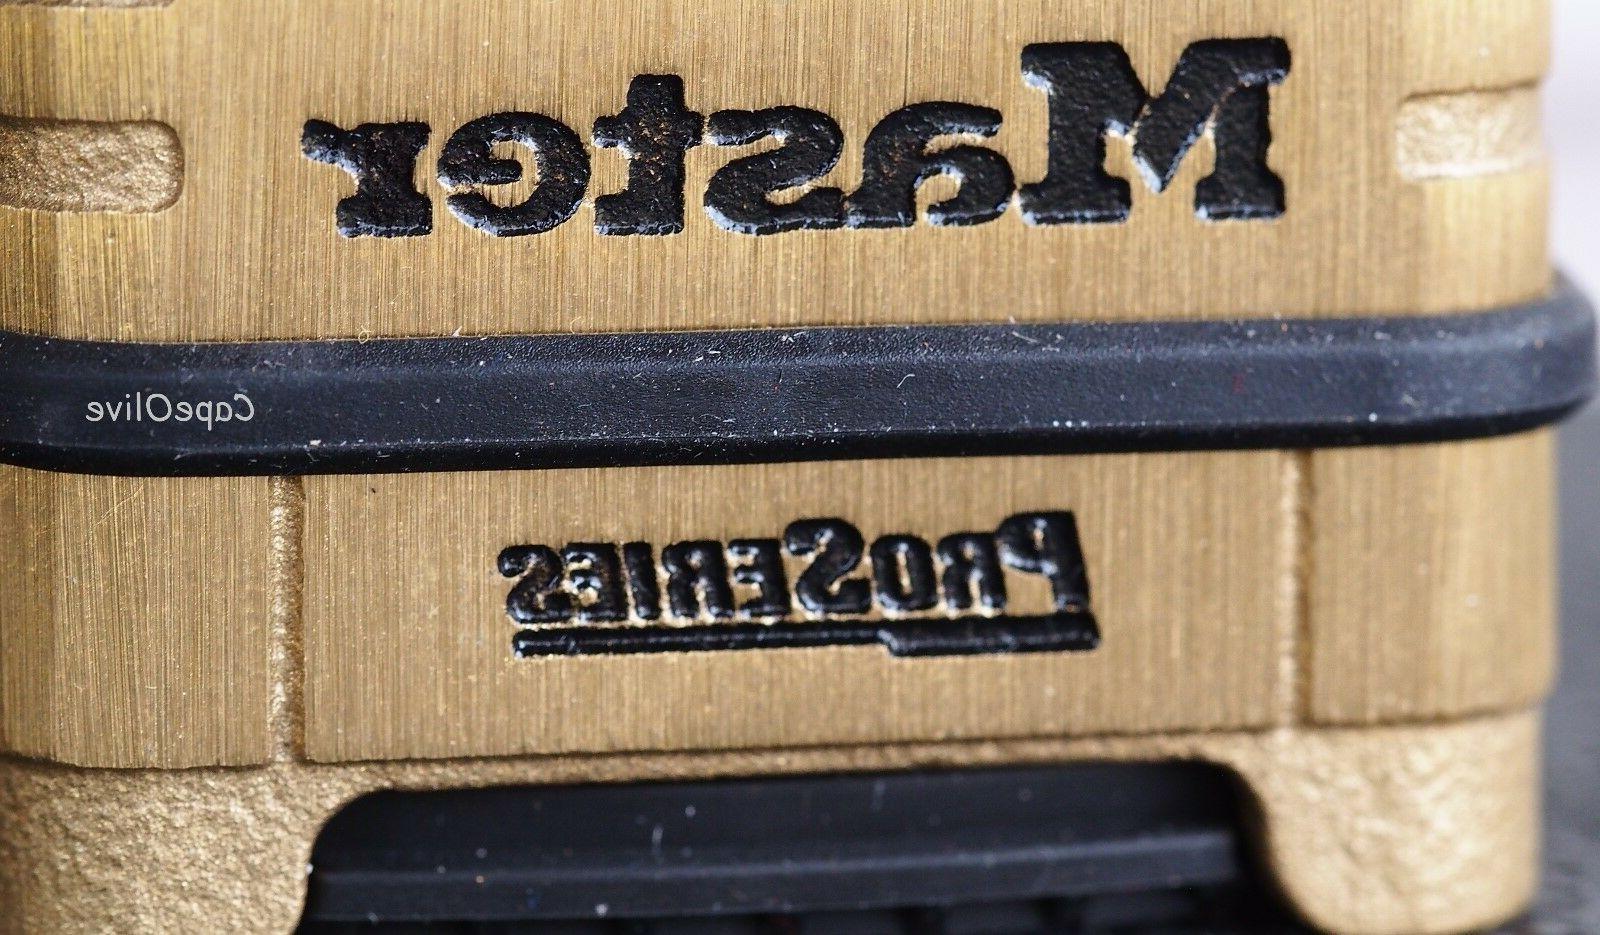 MASTER LOCK Padlock, Bottom, 4 Dial, Brass 1177